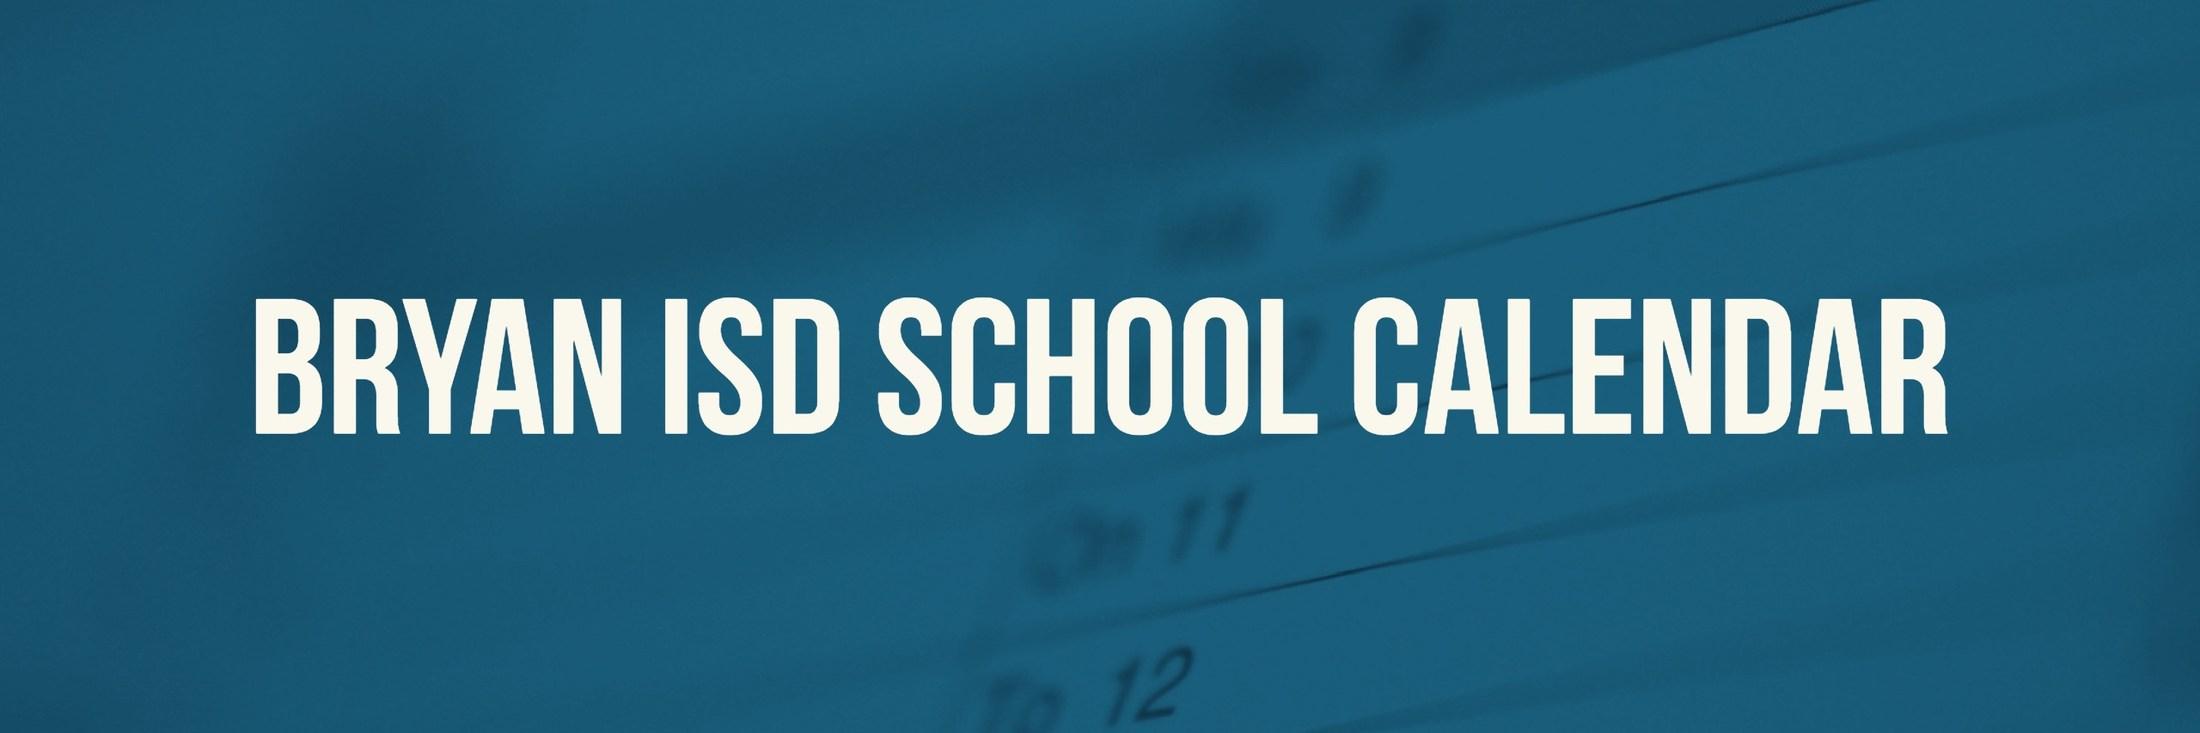 School Calendar, Testing & Fine Arts/athletics Events for Stephen F Austin 2019 2020 Calendar